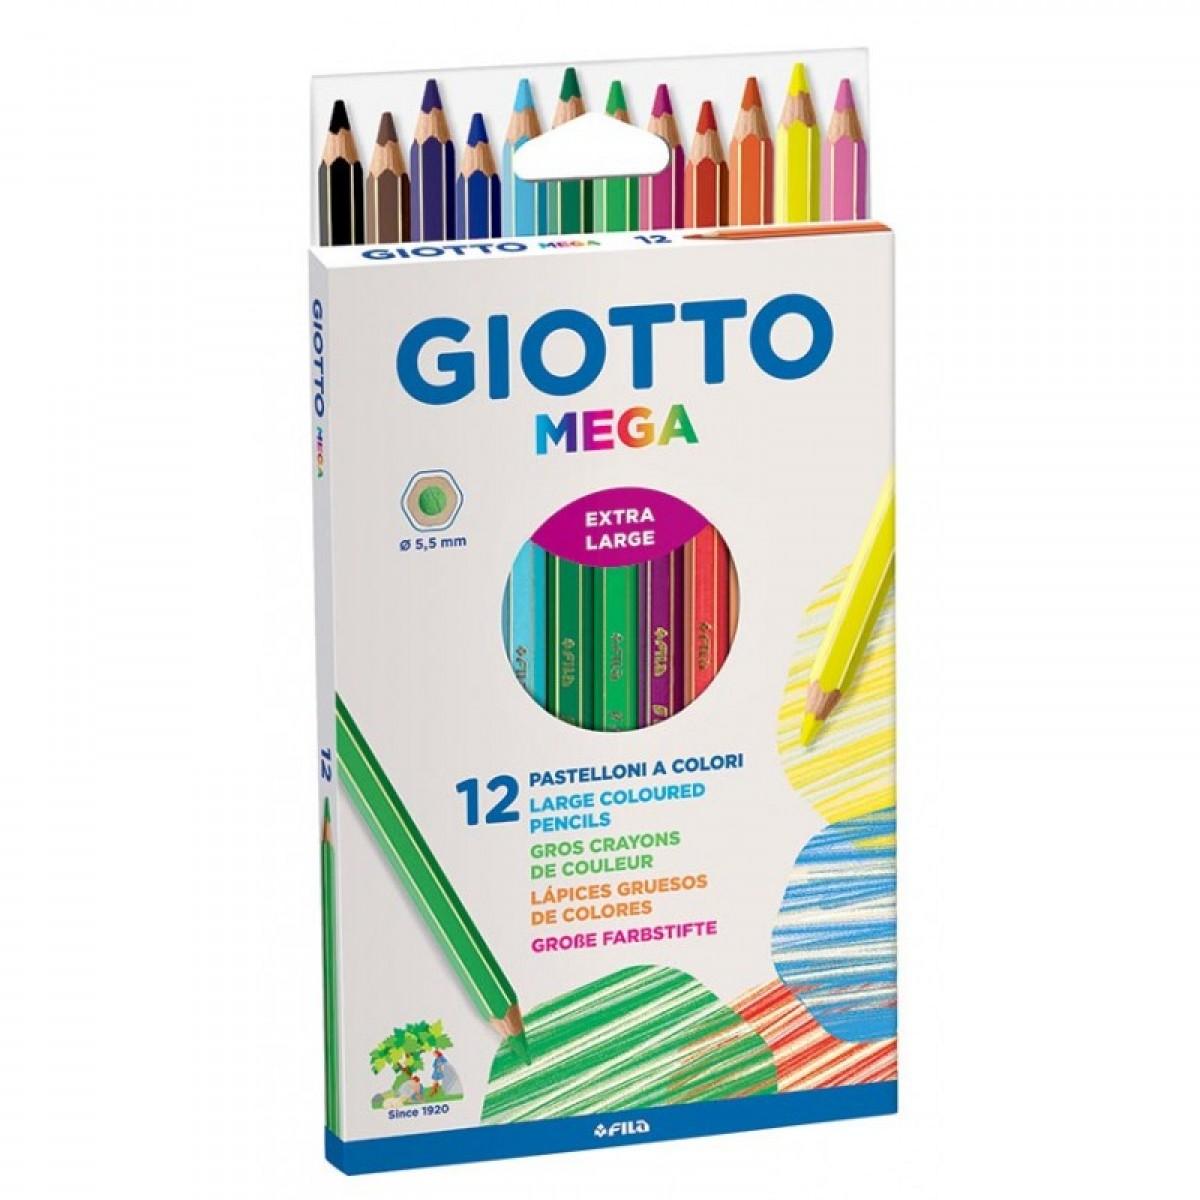 Giotto Ξυλομπογιές 5.5mm (12 Τεμ.) Ξυλομπογιές